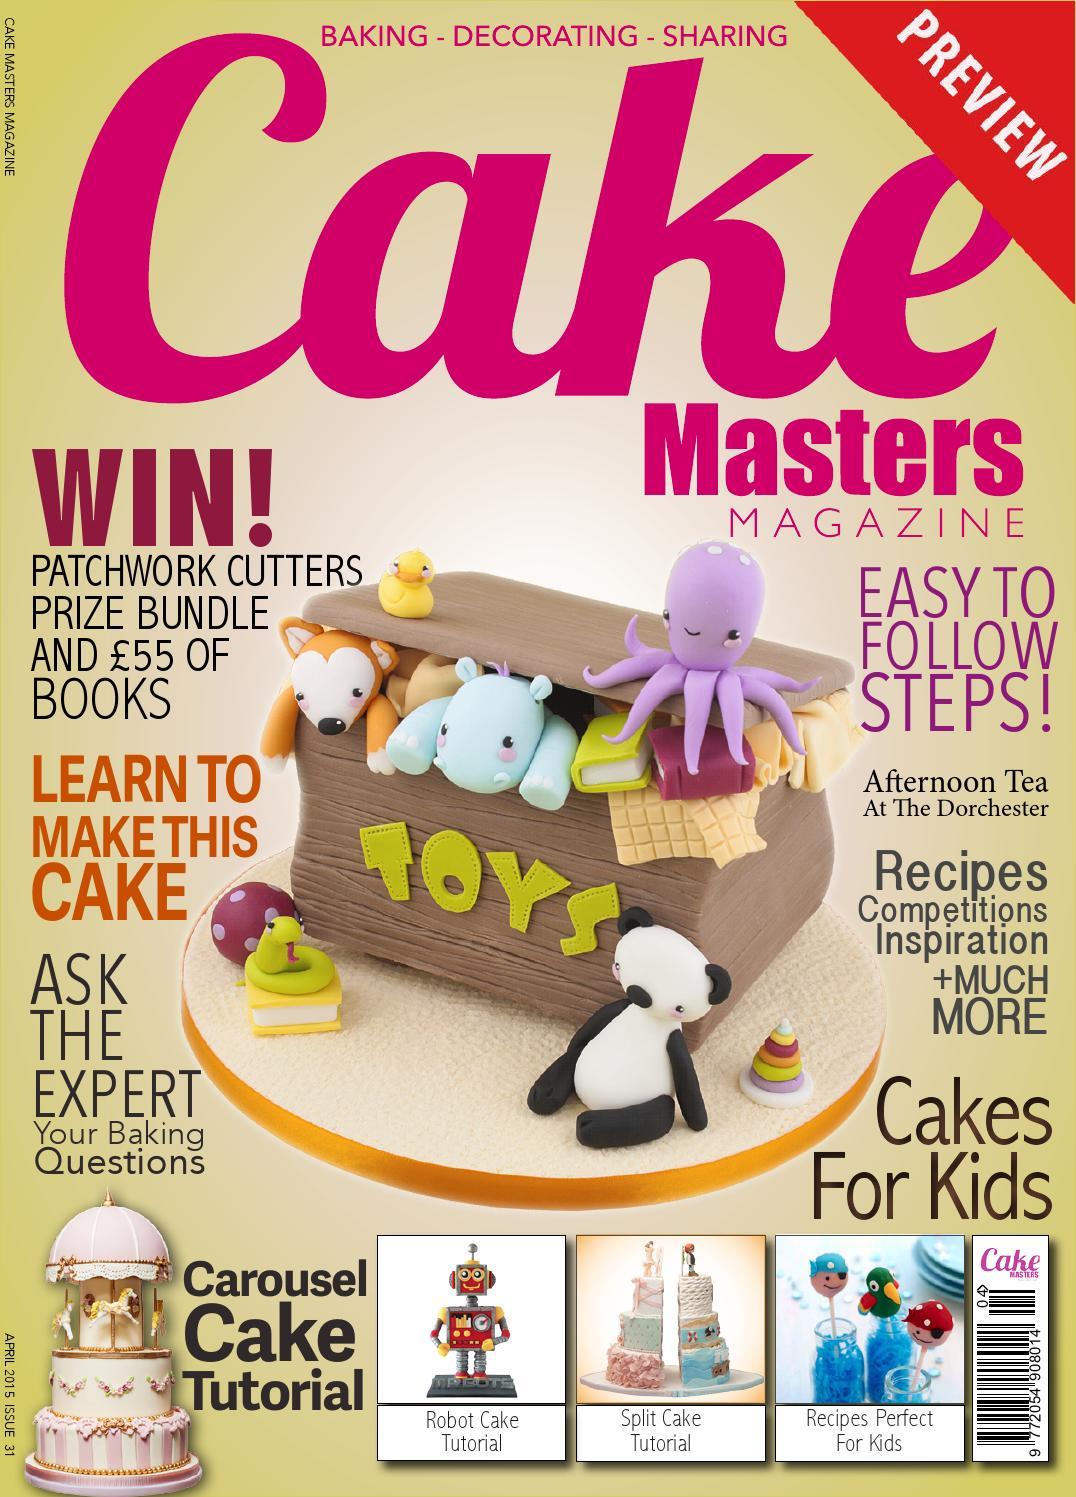 American Cake Decorating; A SUPAH Cool Cake Magazine